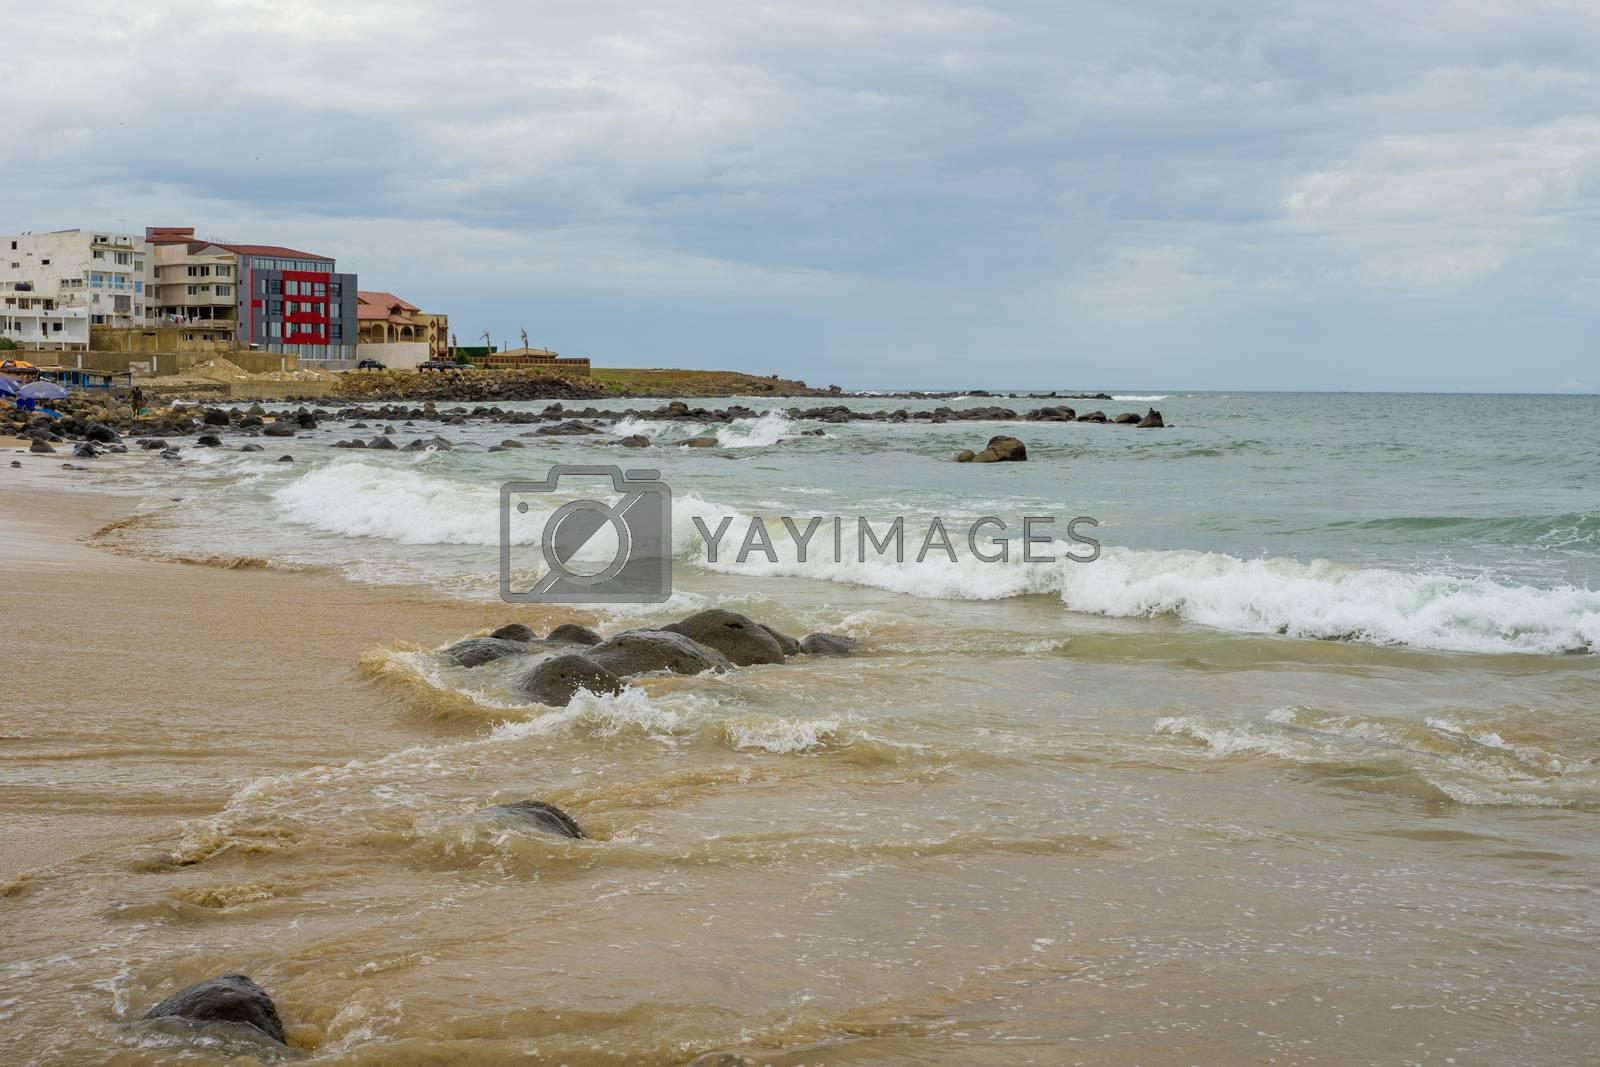 Royalty free image of Dakar Beach by derejeb